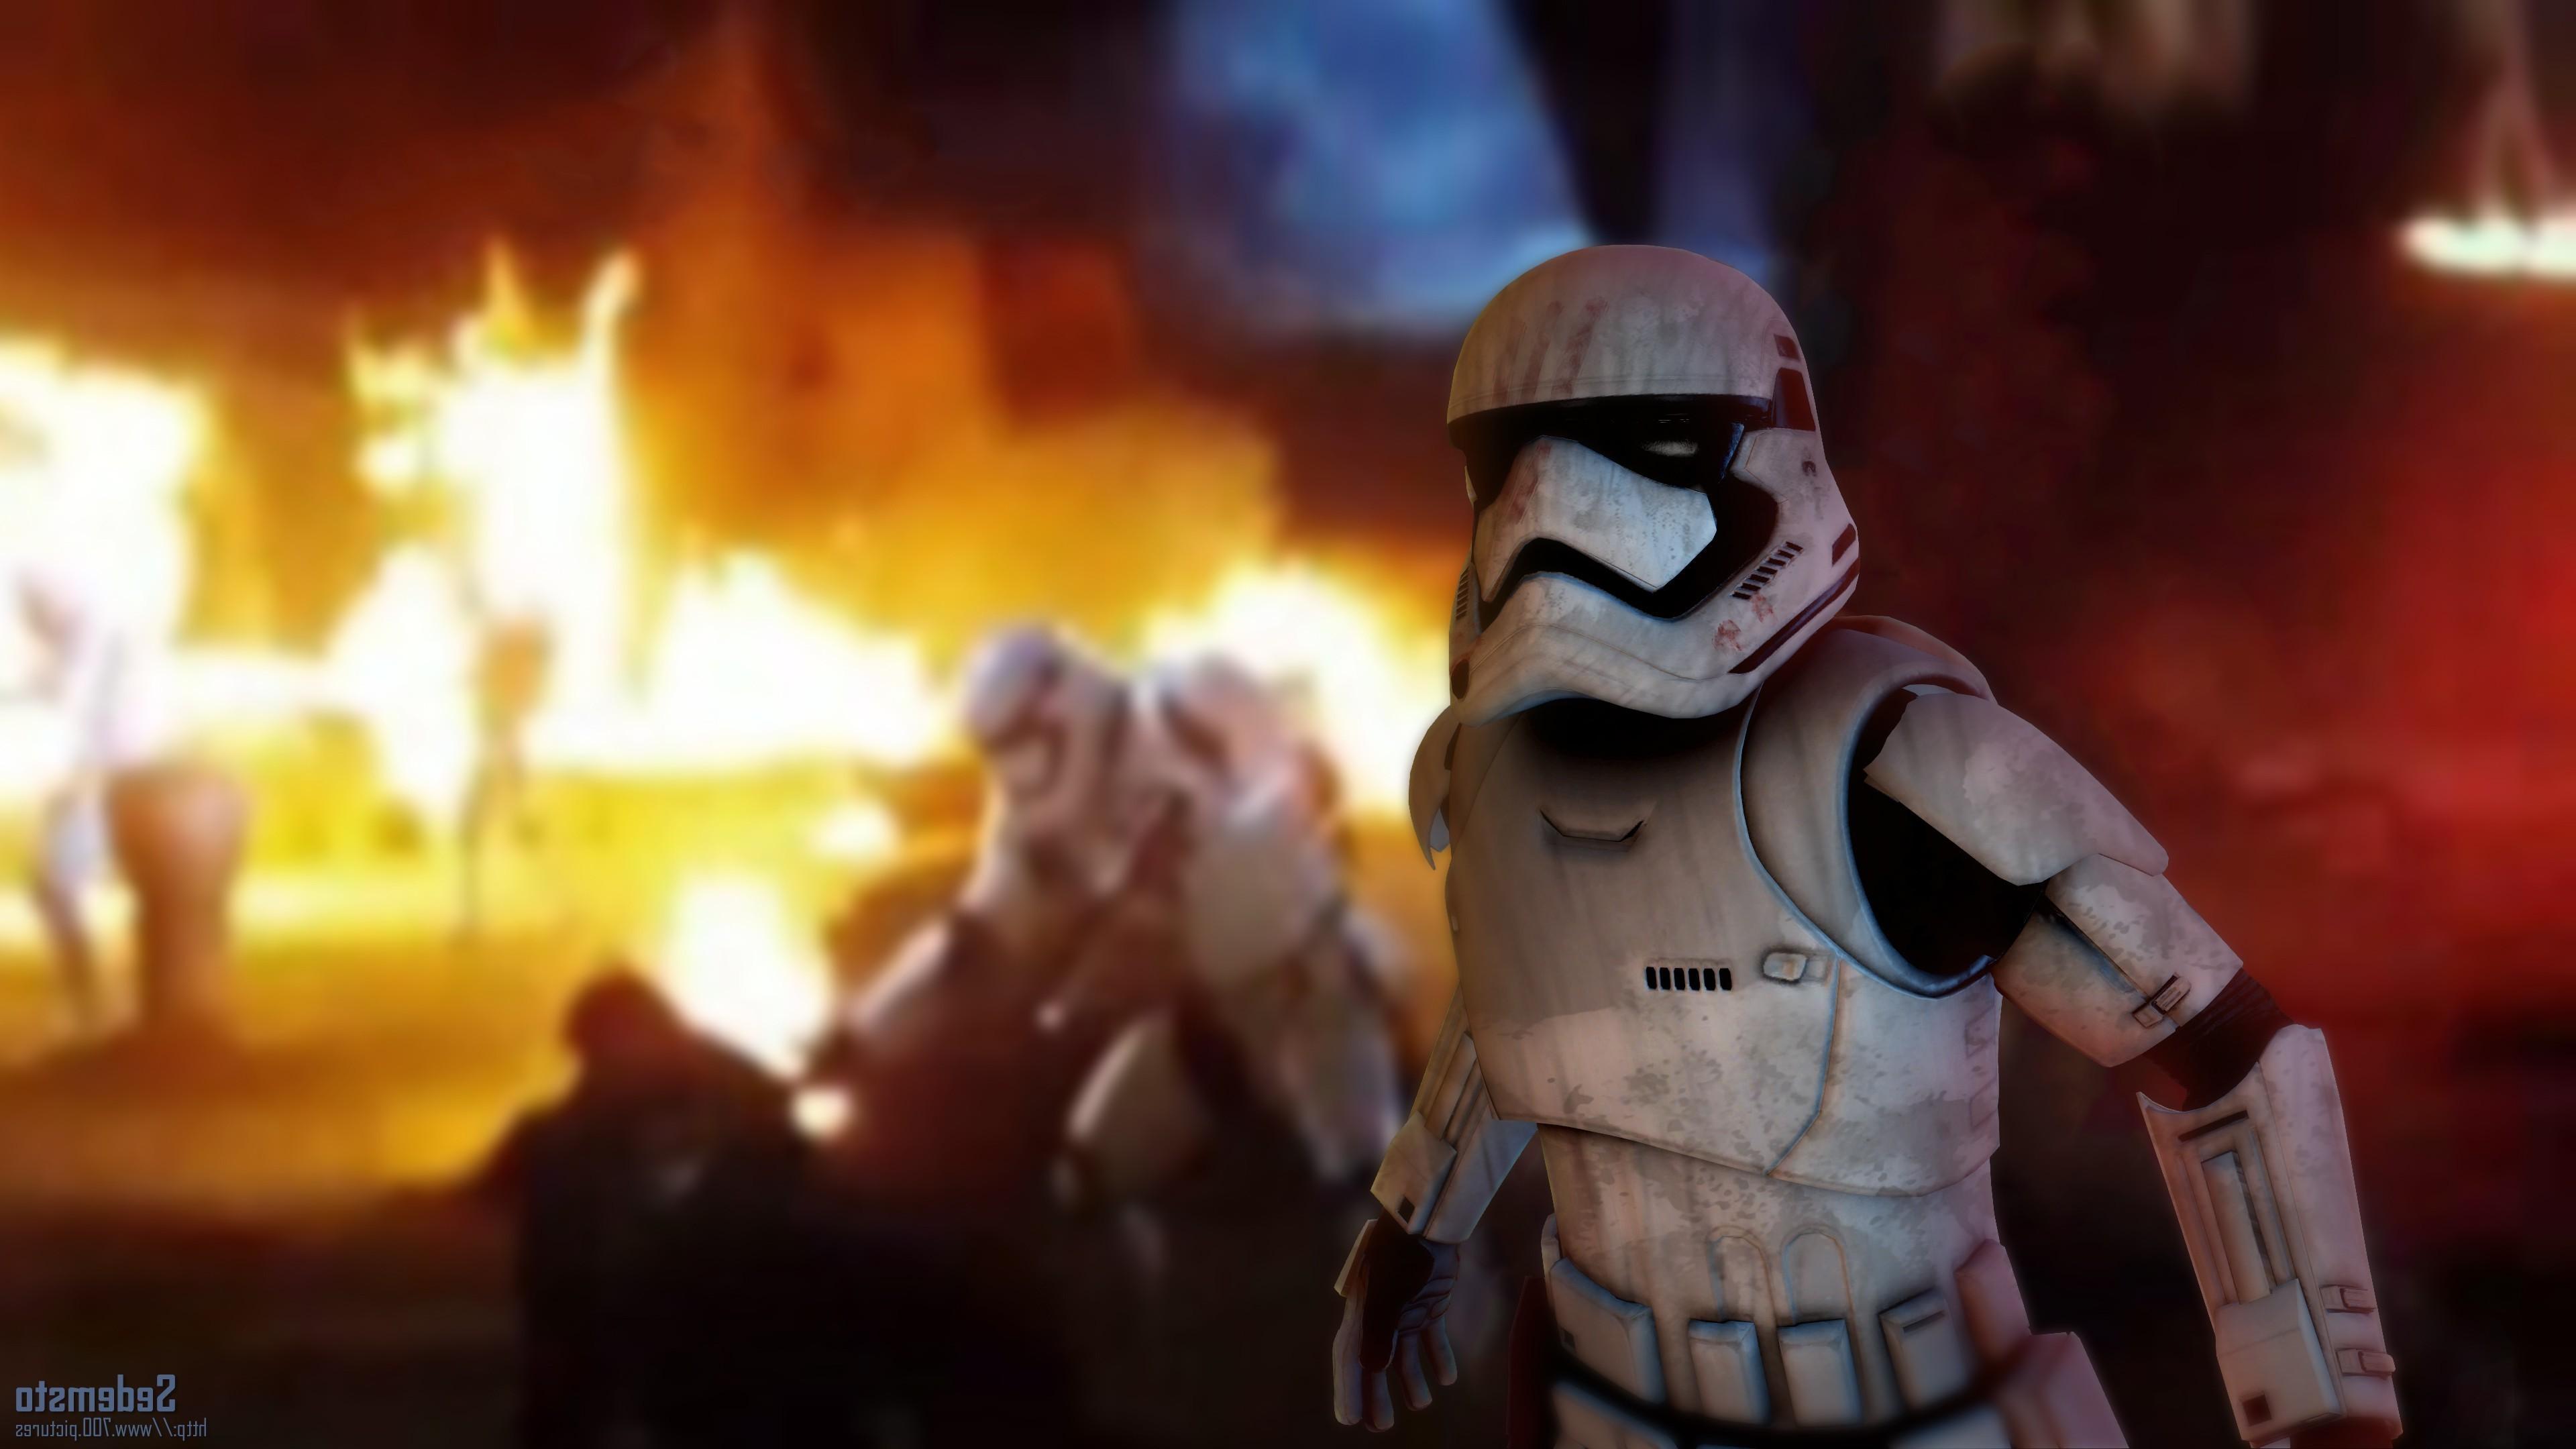 Star Wars, Star Wars: Episode VII The Force Awakens, Fan Art Wallpapers HD  / Desktop and Mobile Backgrounds